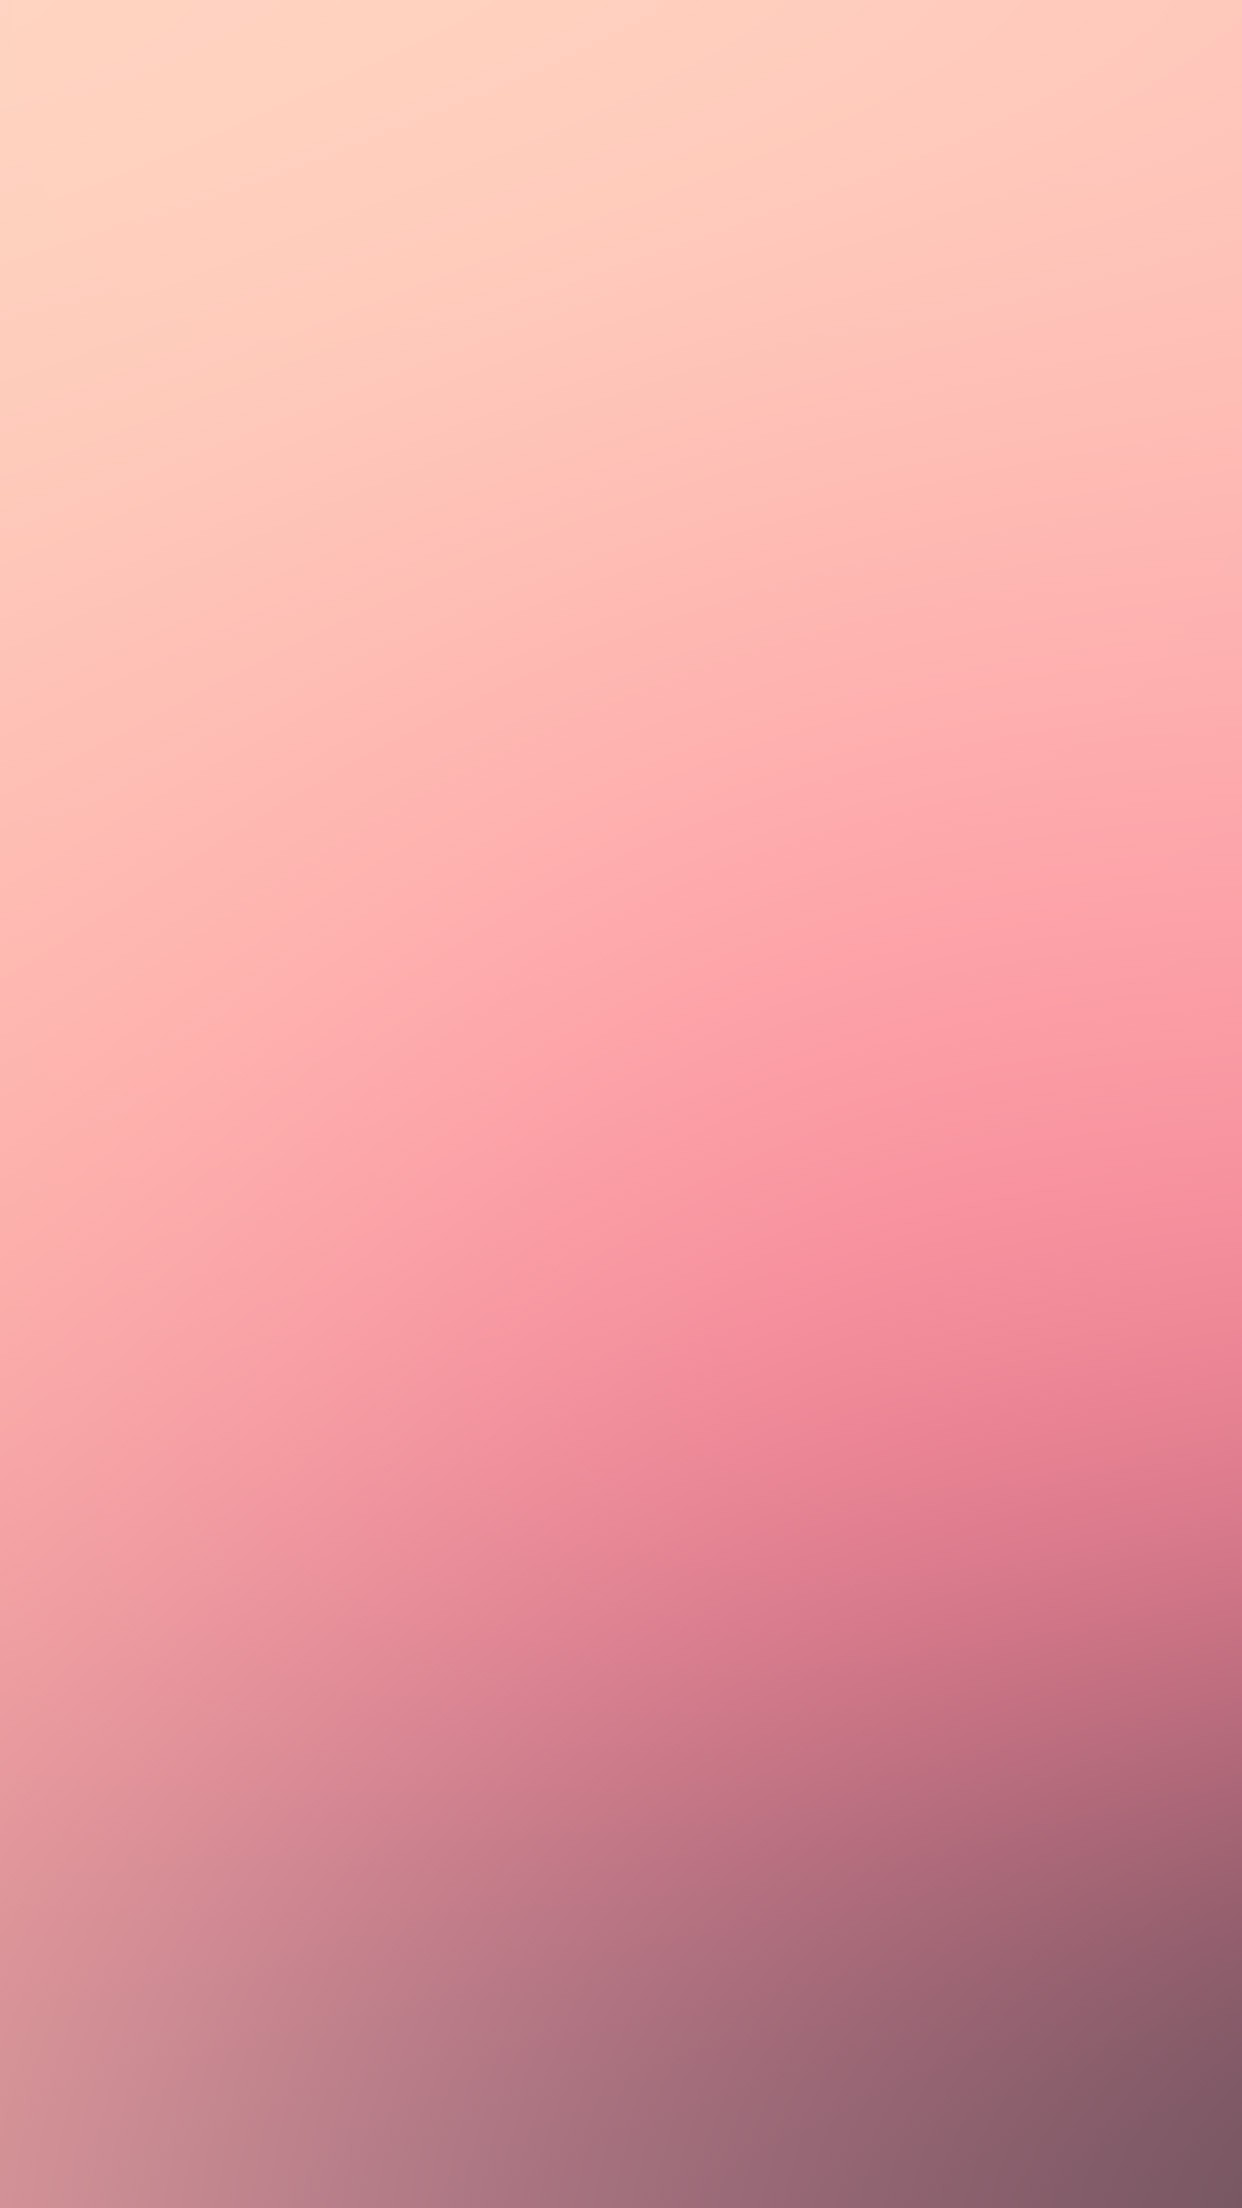 Orange Pink Rosegold Soft Night Gradation Blur